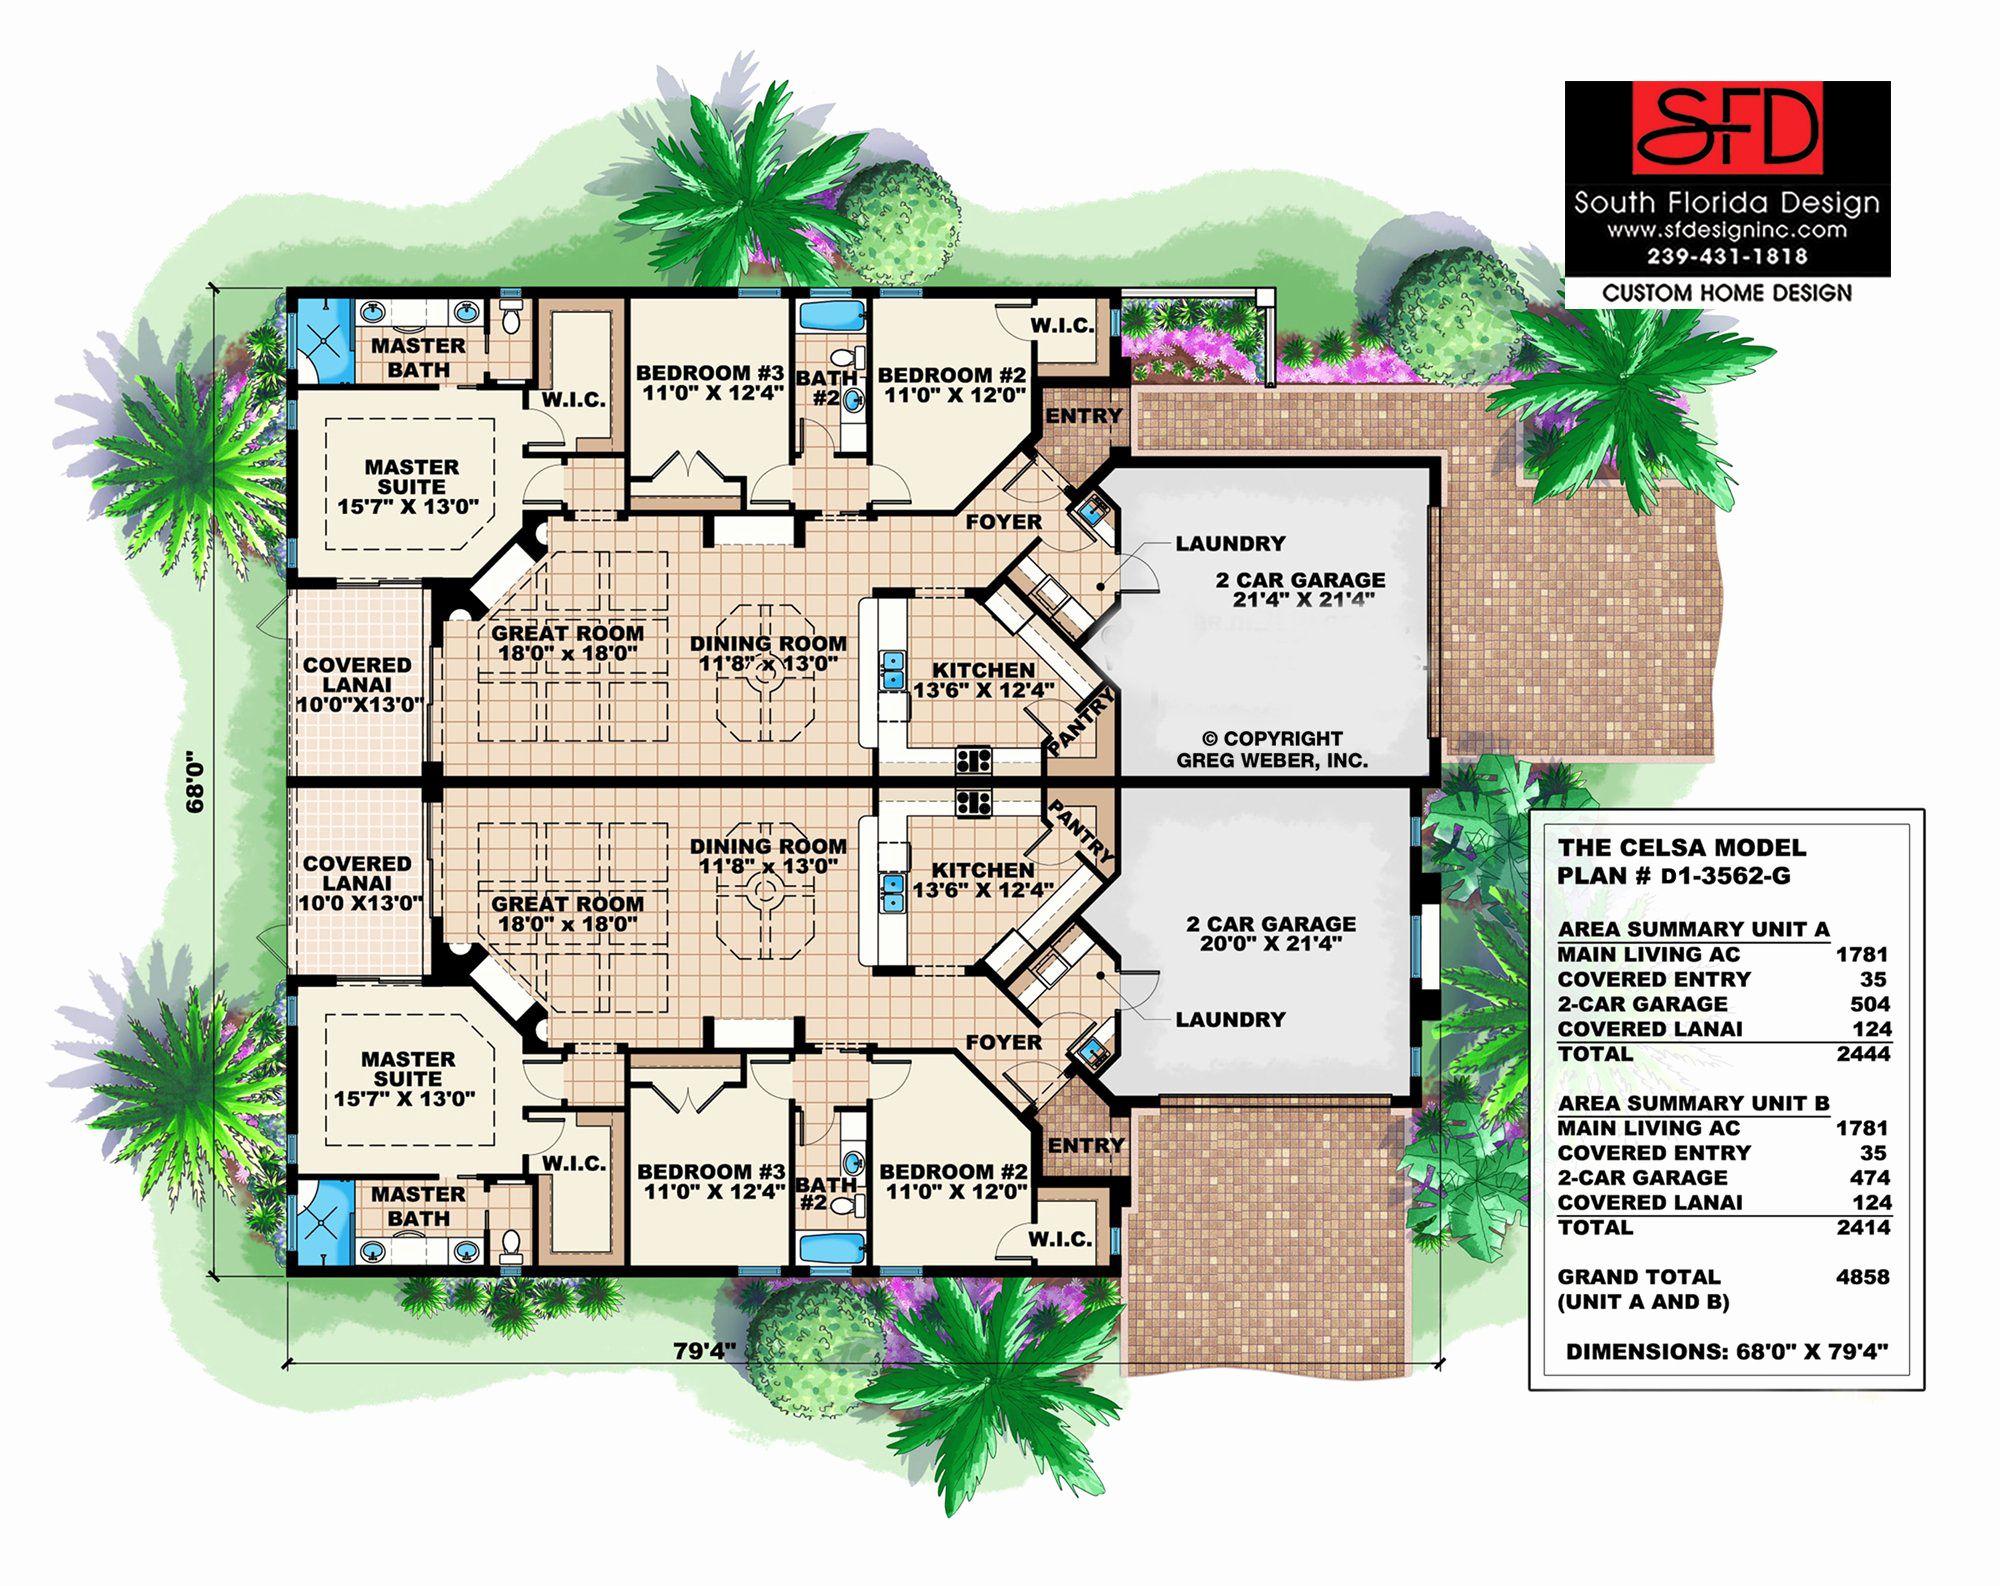 Duplex Floor Plans With Garage Best Bungalow Floor Plans Mega Duplex Floor Plans Bungalow House Plans Bedroom House Plans